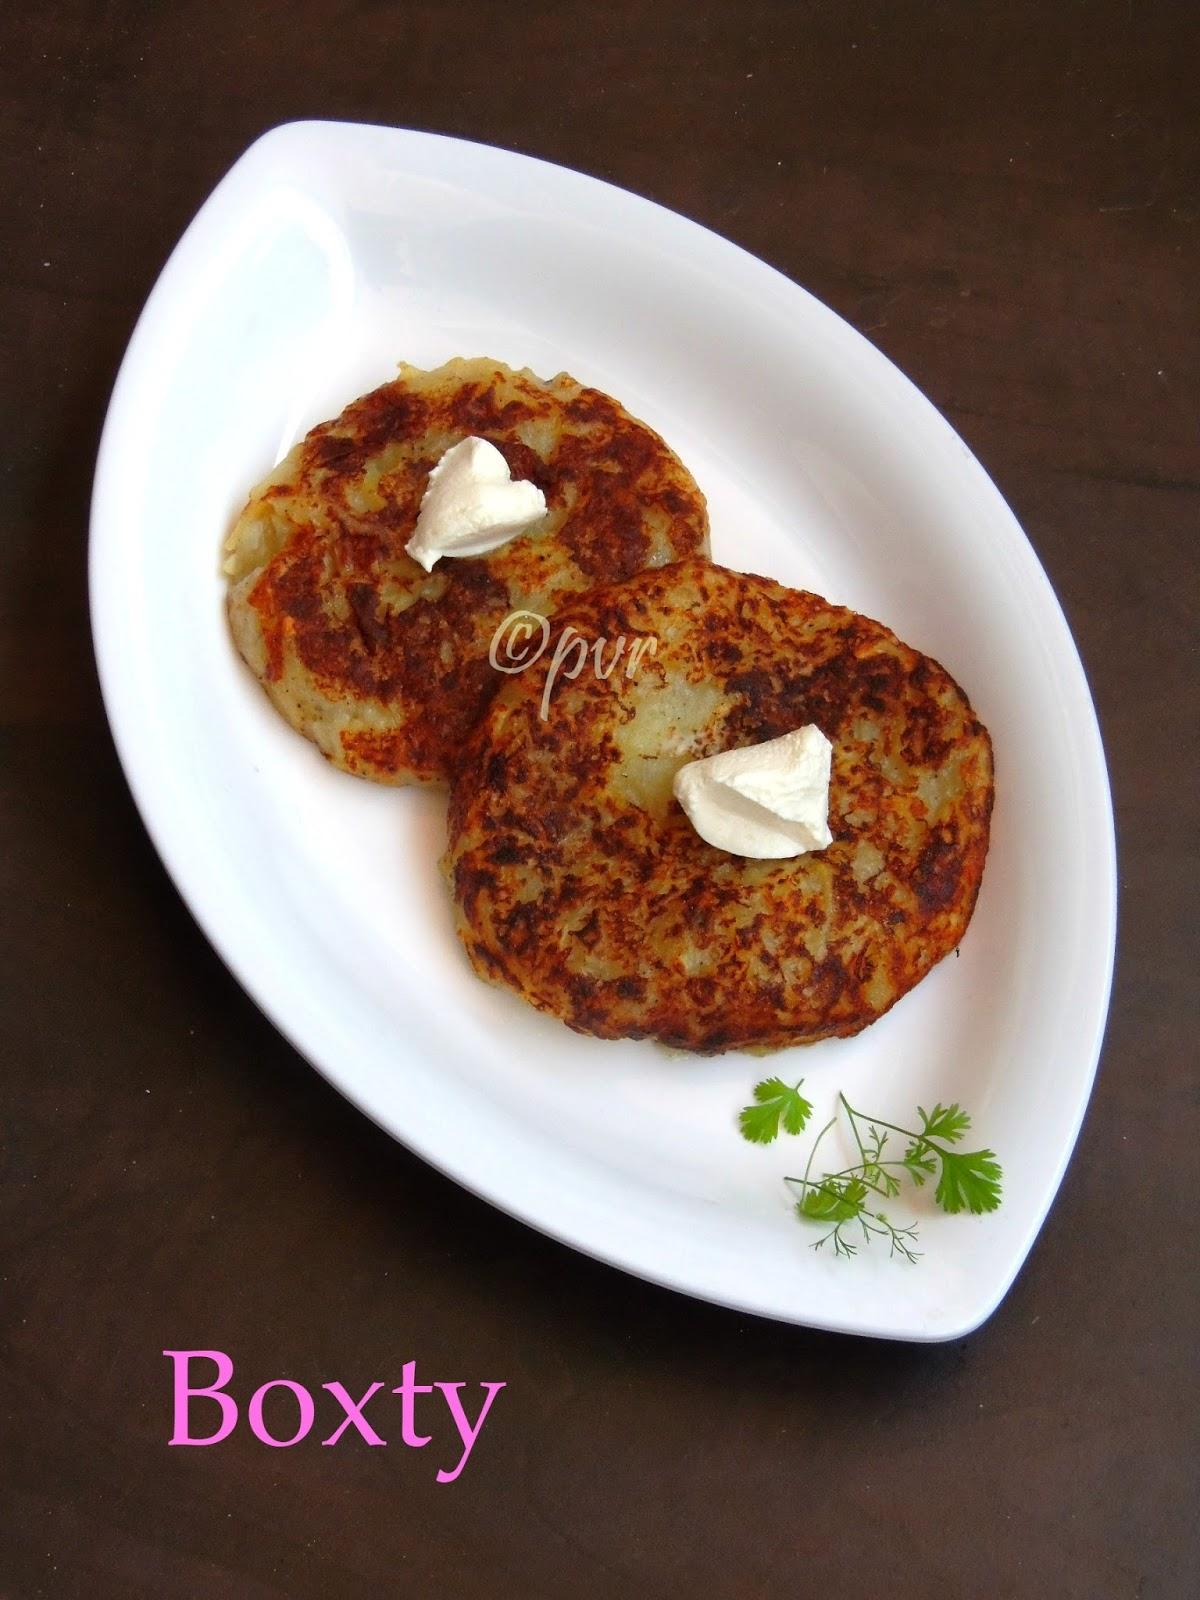 Potato Boxty Recipe — Dishmaps